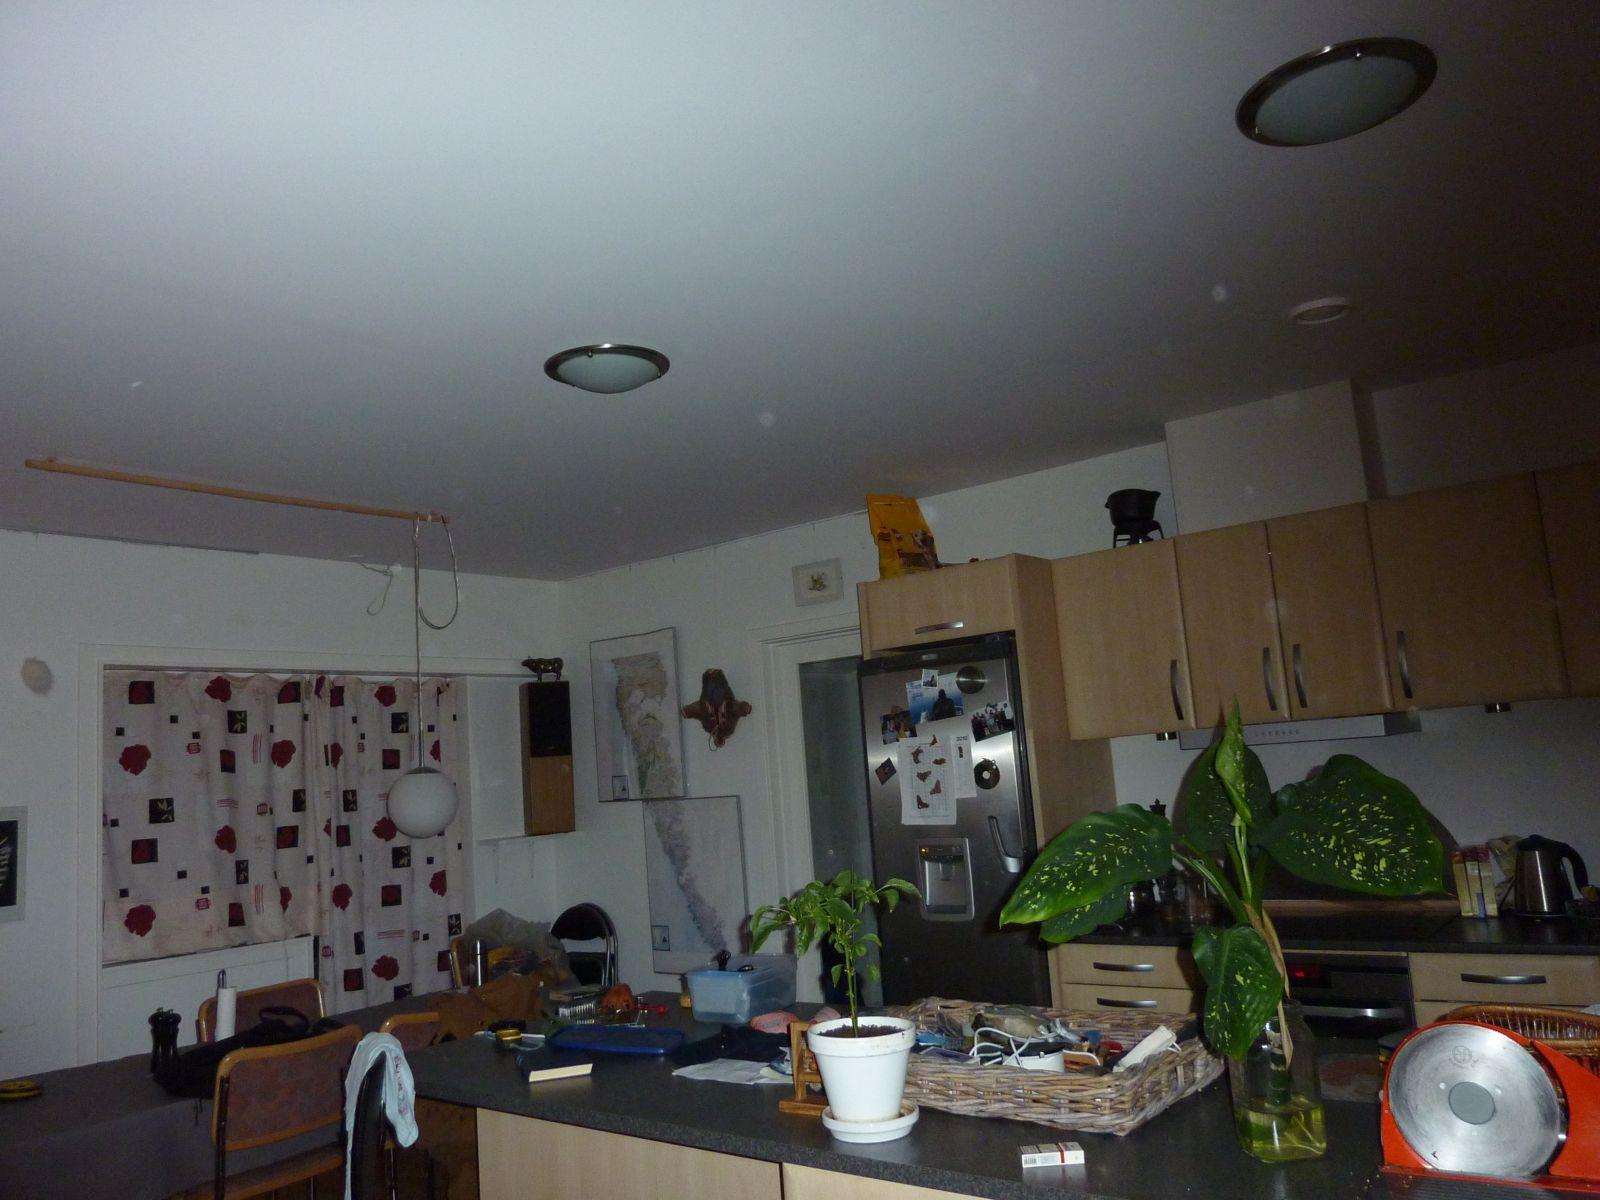 2010-08-07-0407_-_Indretning; Pupik 4-102